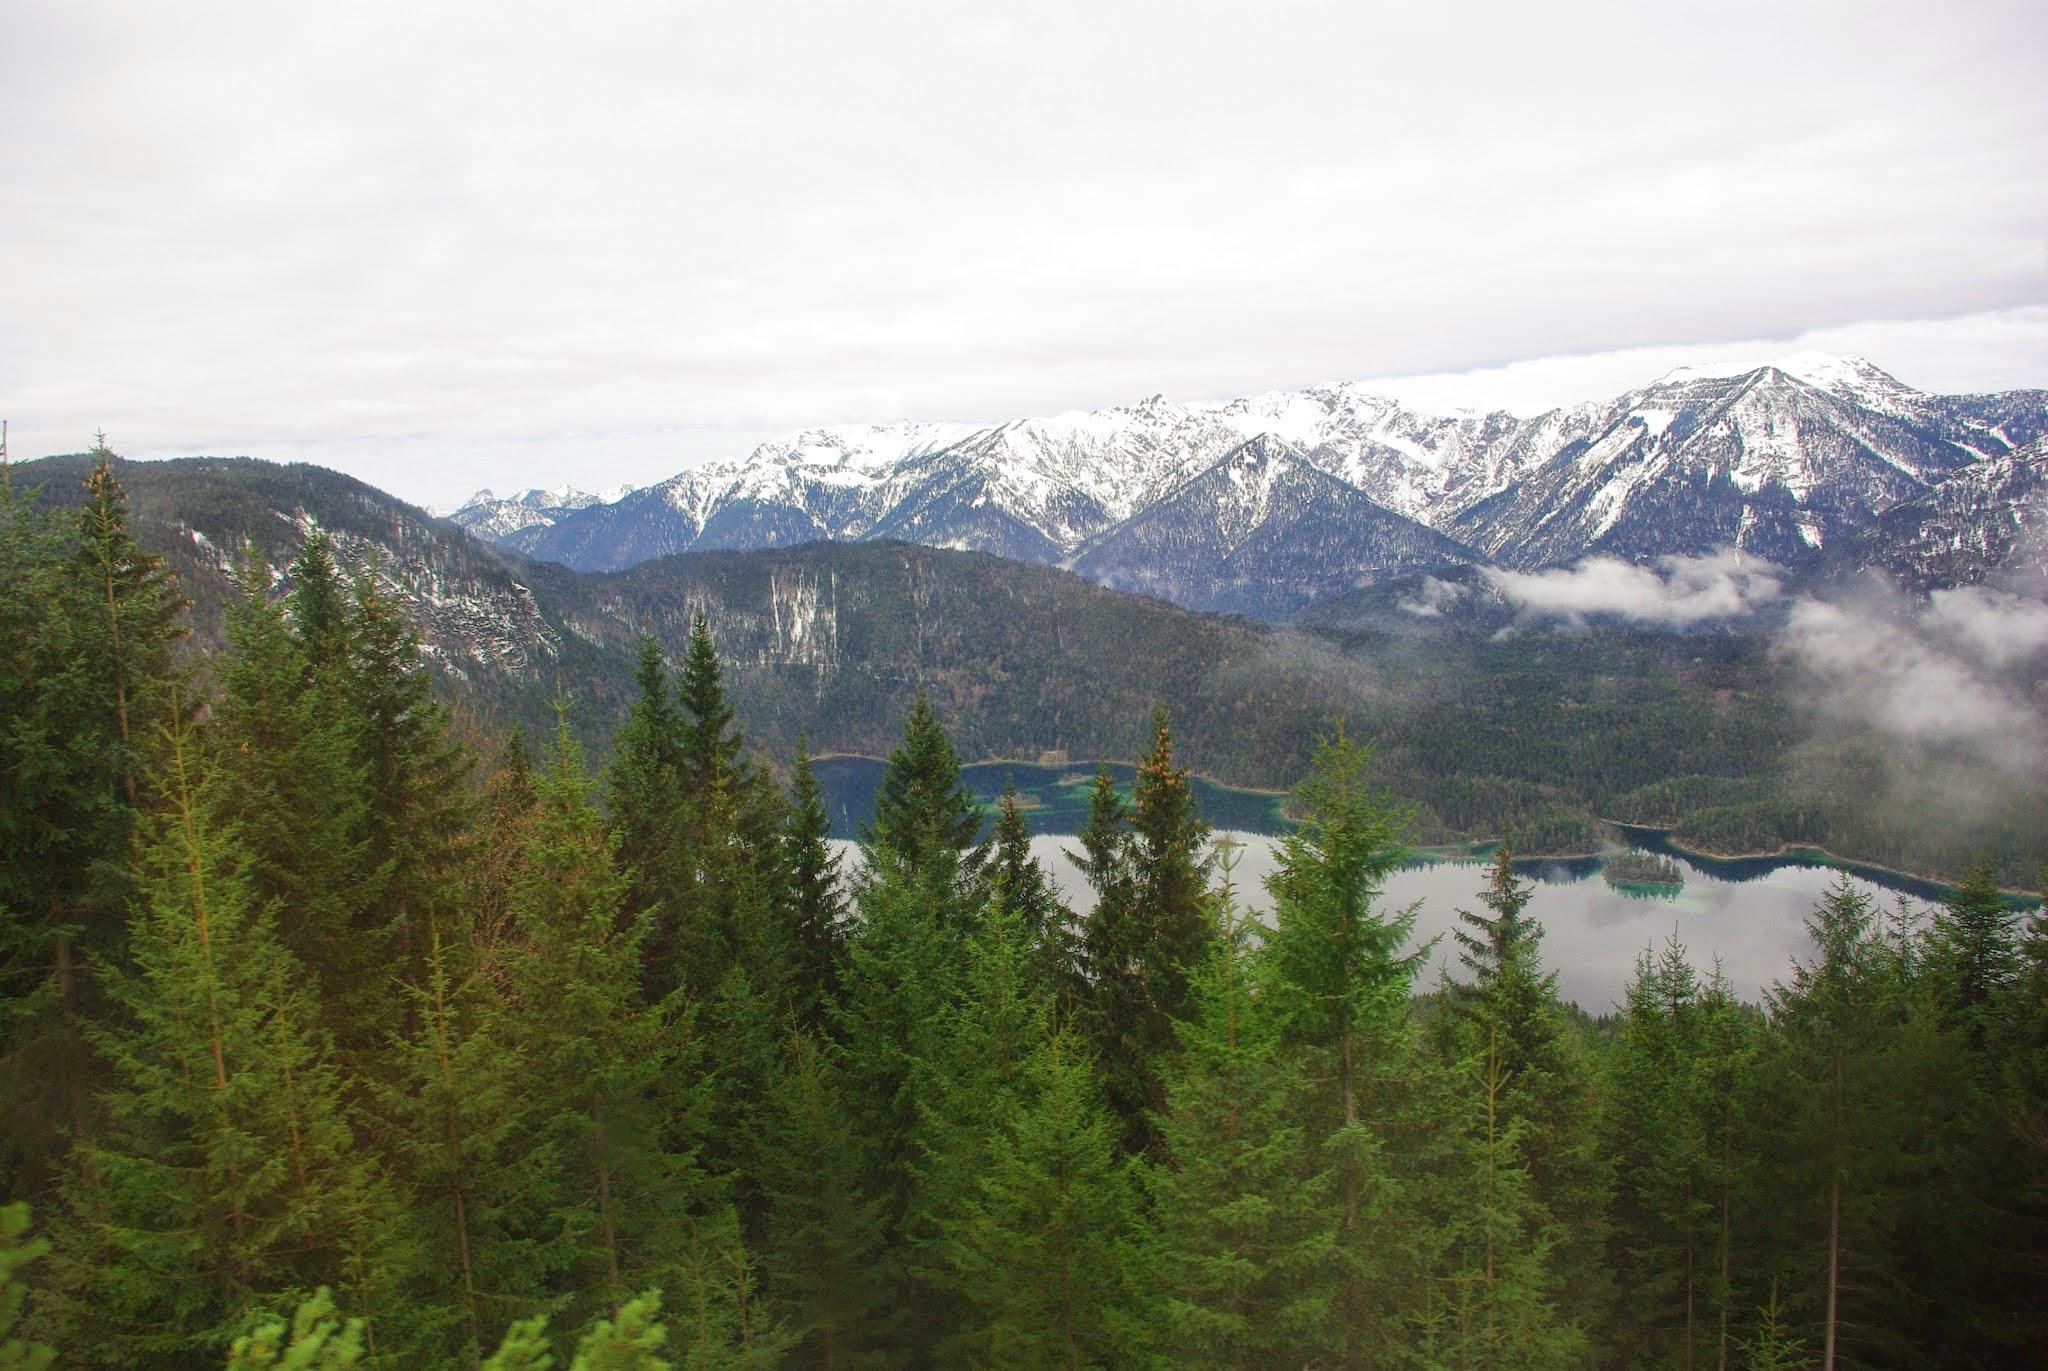 Lake Eibsee as seen from the cogwheel train.